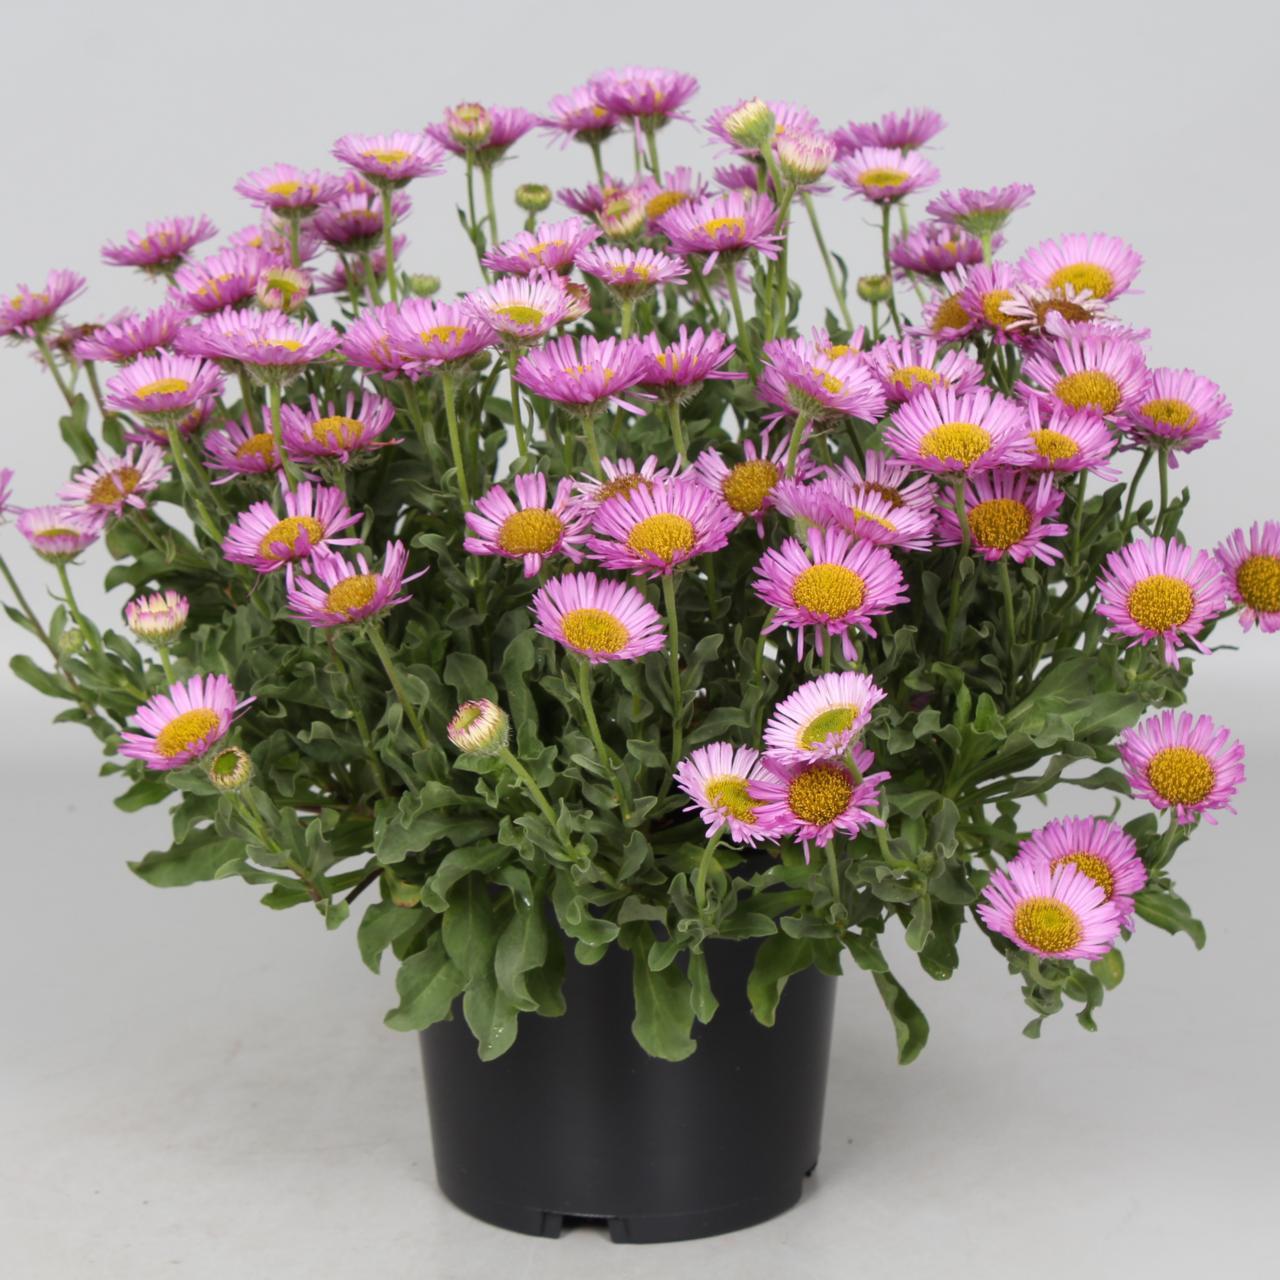 Erigeron glaucus 'Sea Breeze' plant